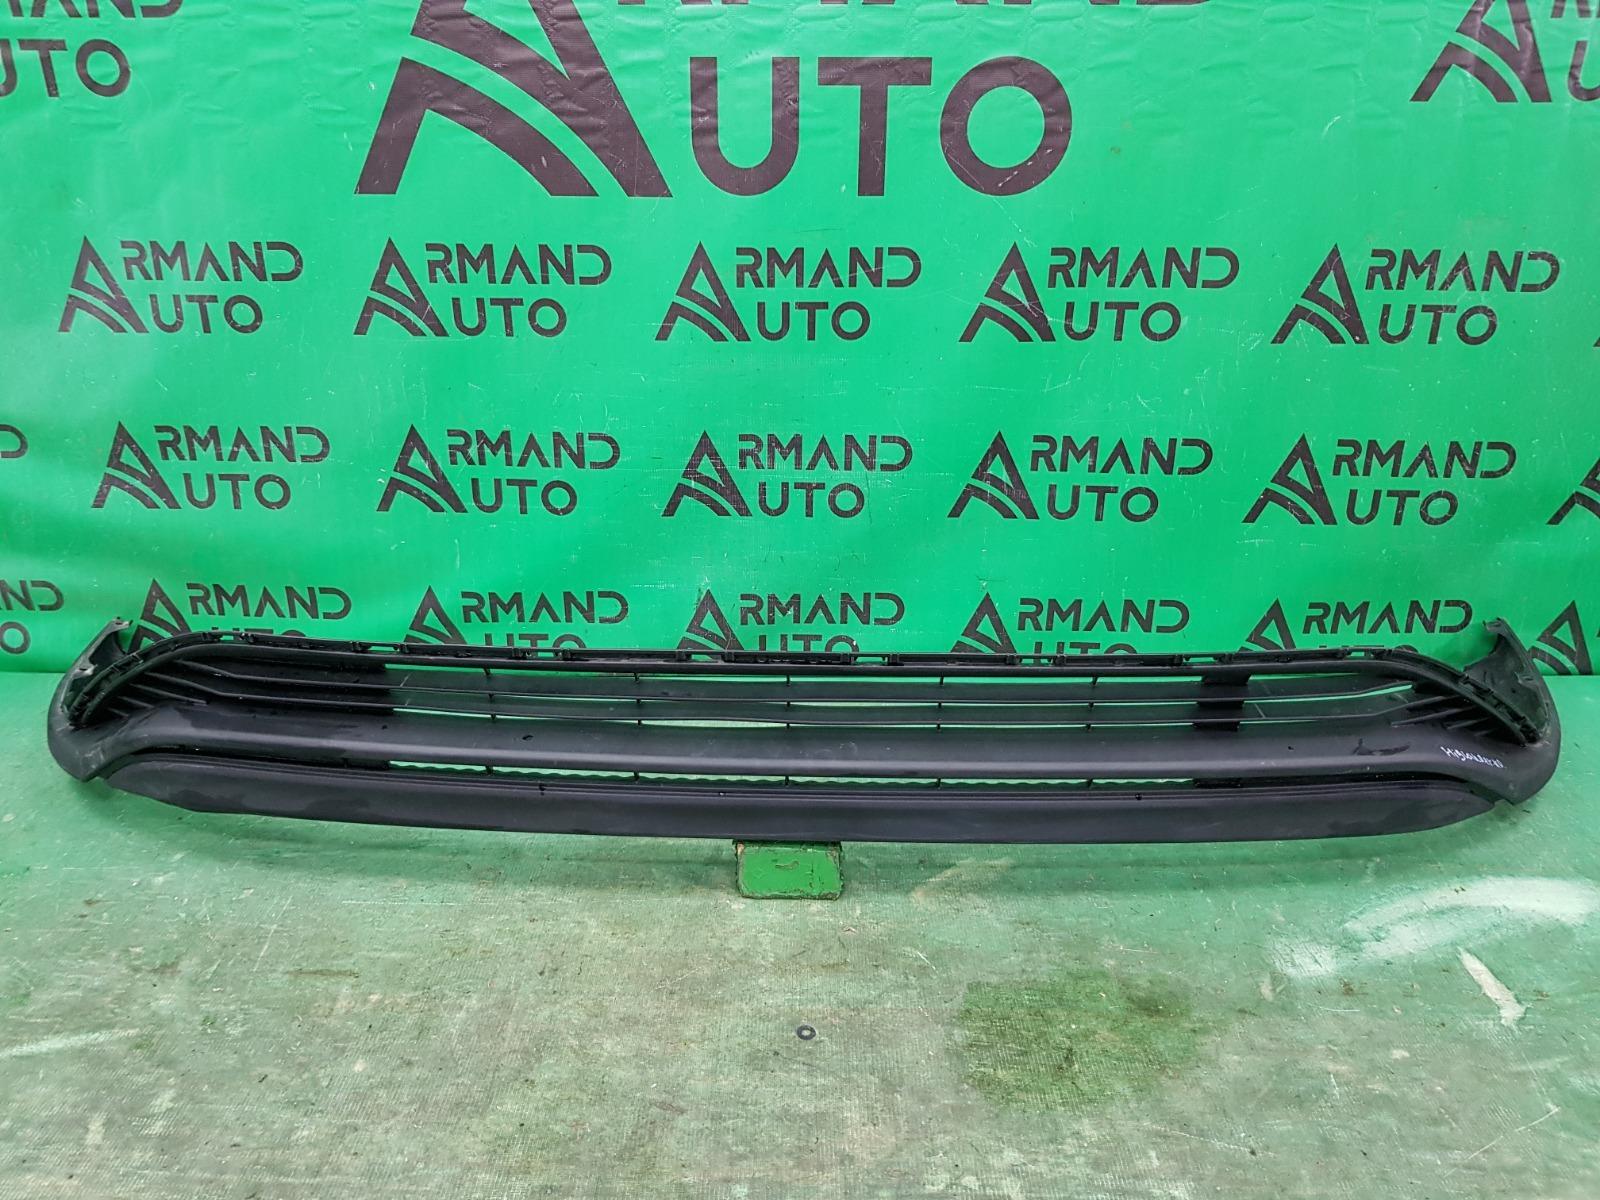 Юбка бампера Toyota Highlander 4 2020 (б/у)